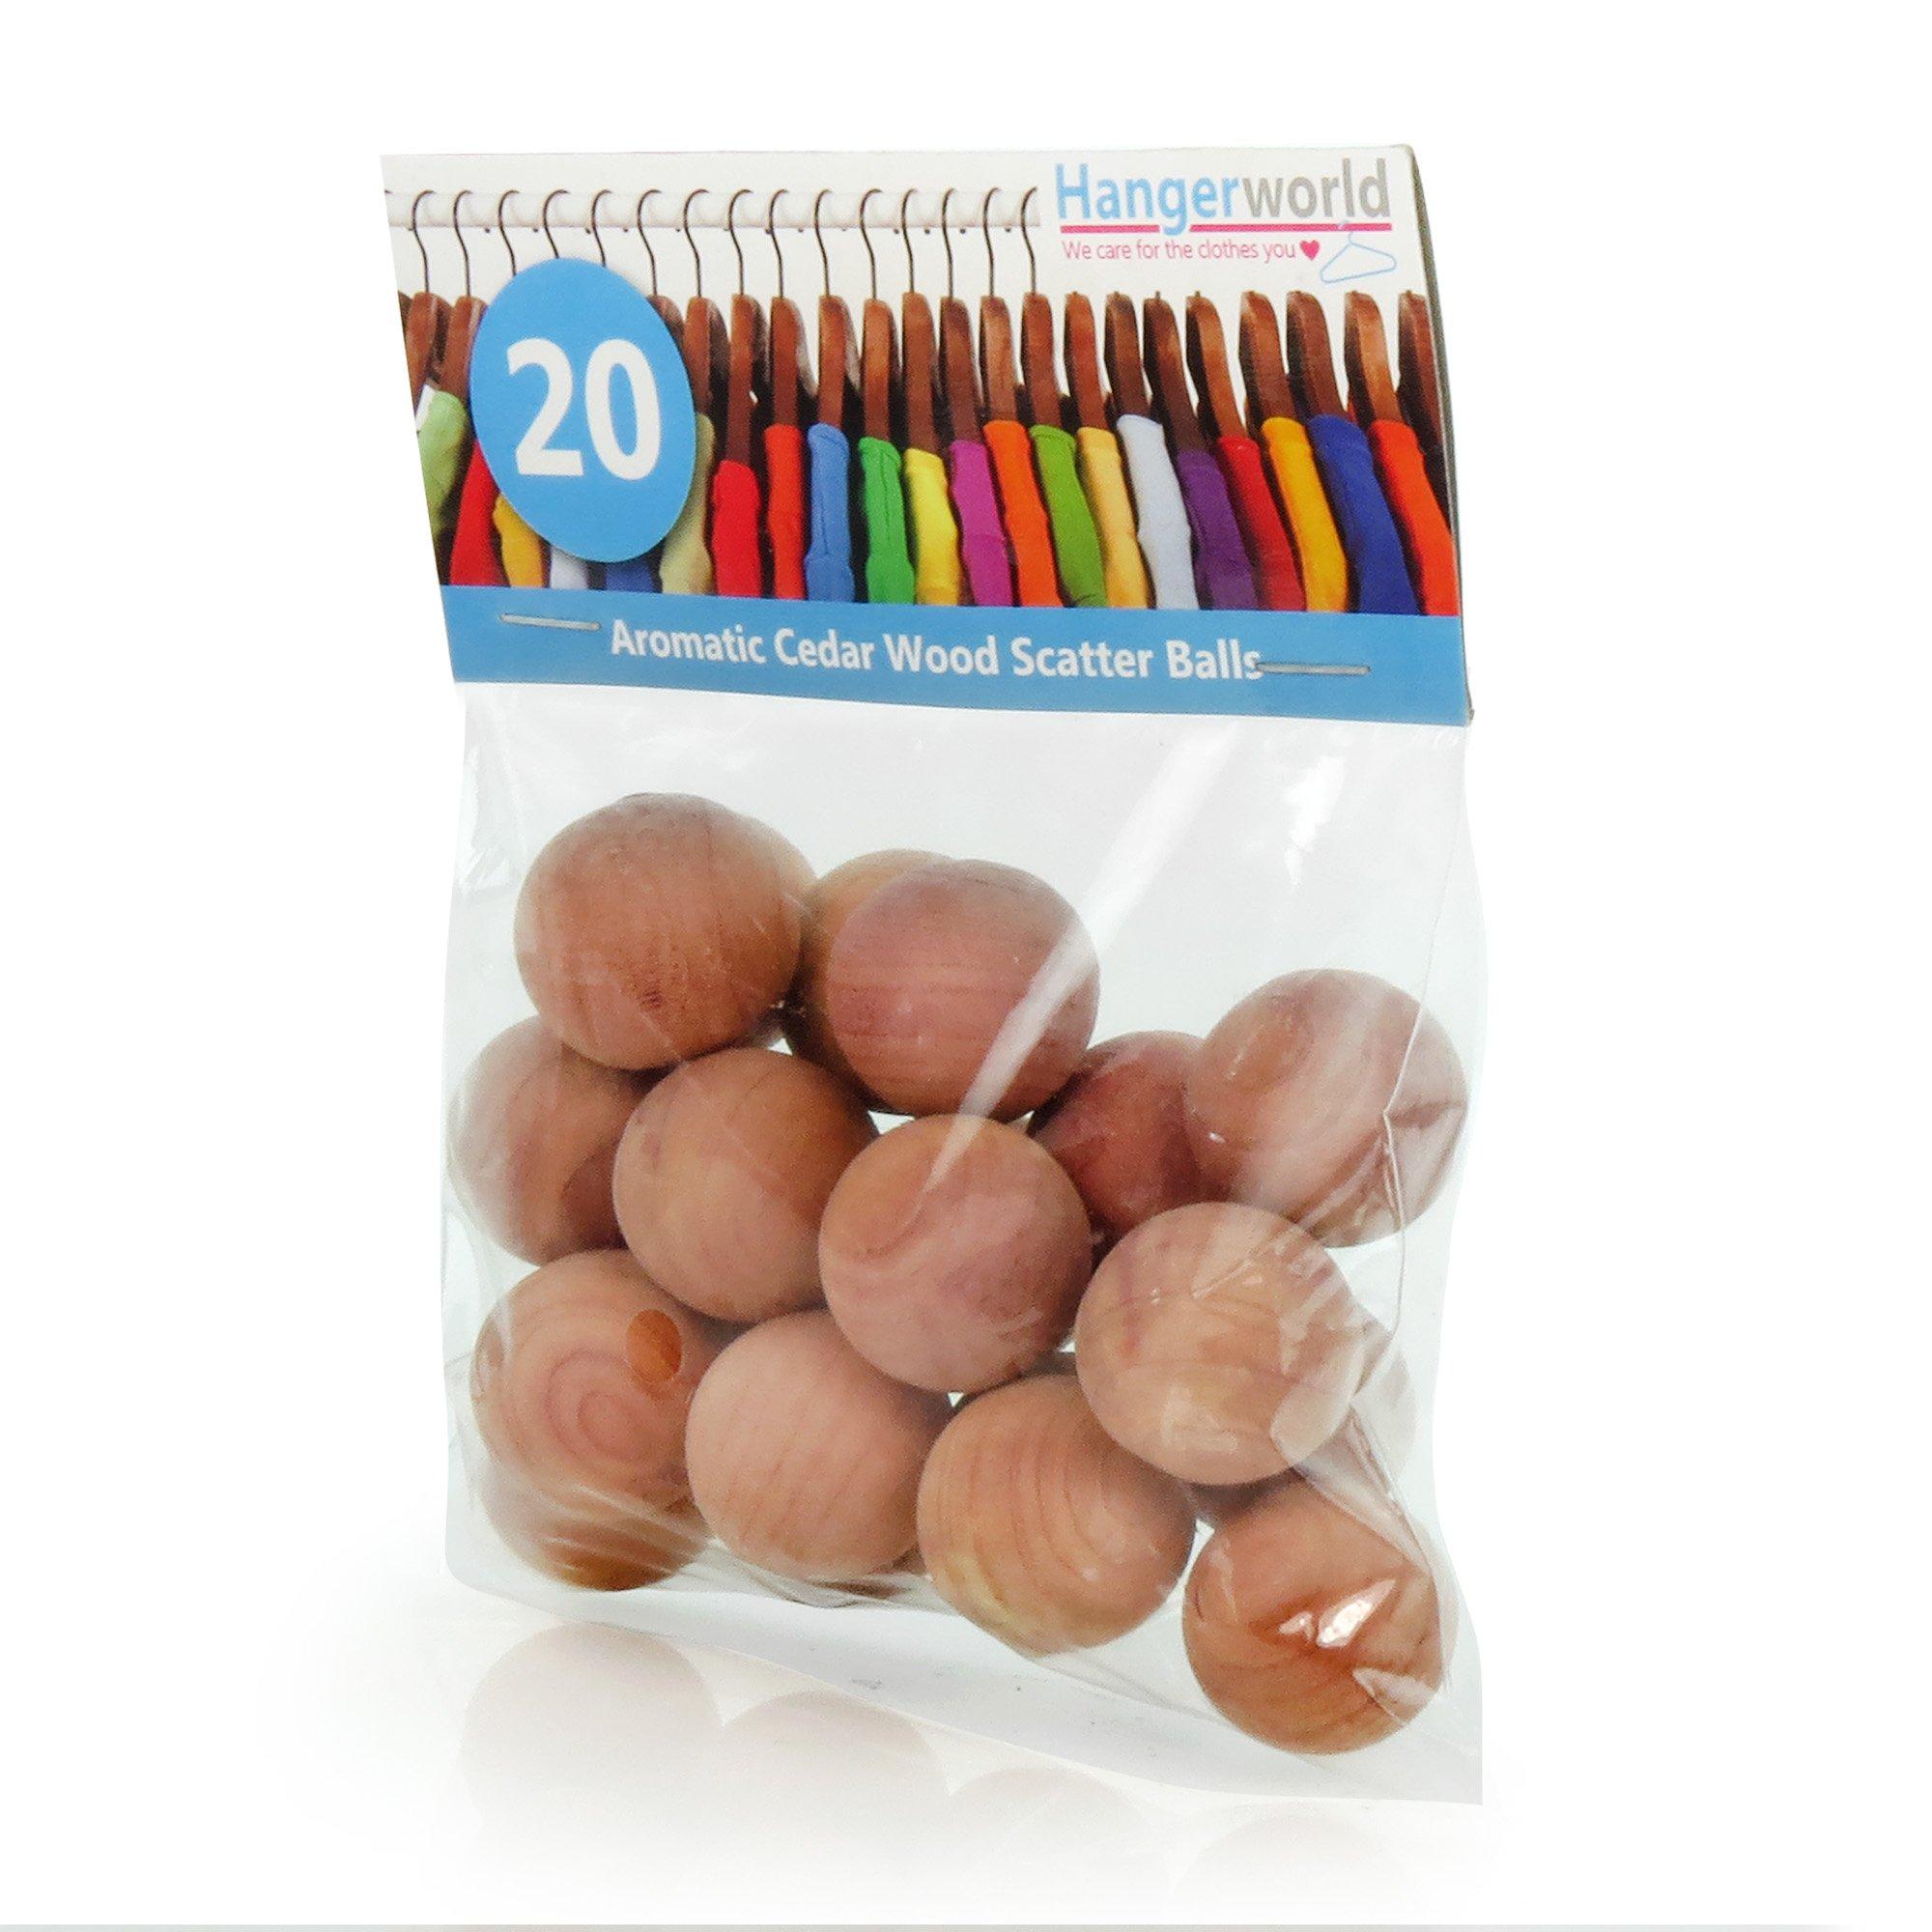 Hangerworld Pack Of 20 Cedar Wood Balls   Natural Moth Repellent For  Drawers, Storage Boxes